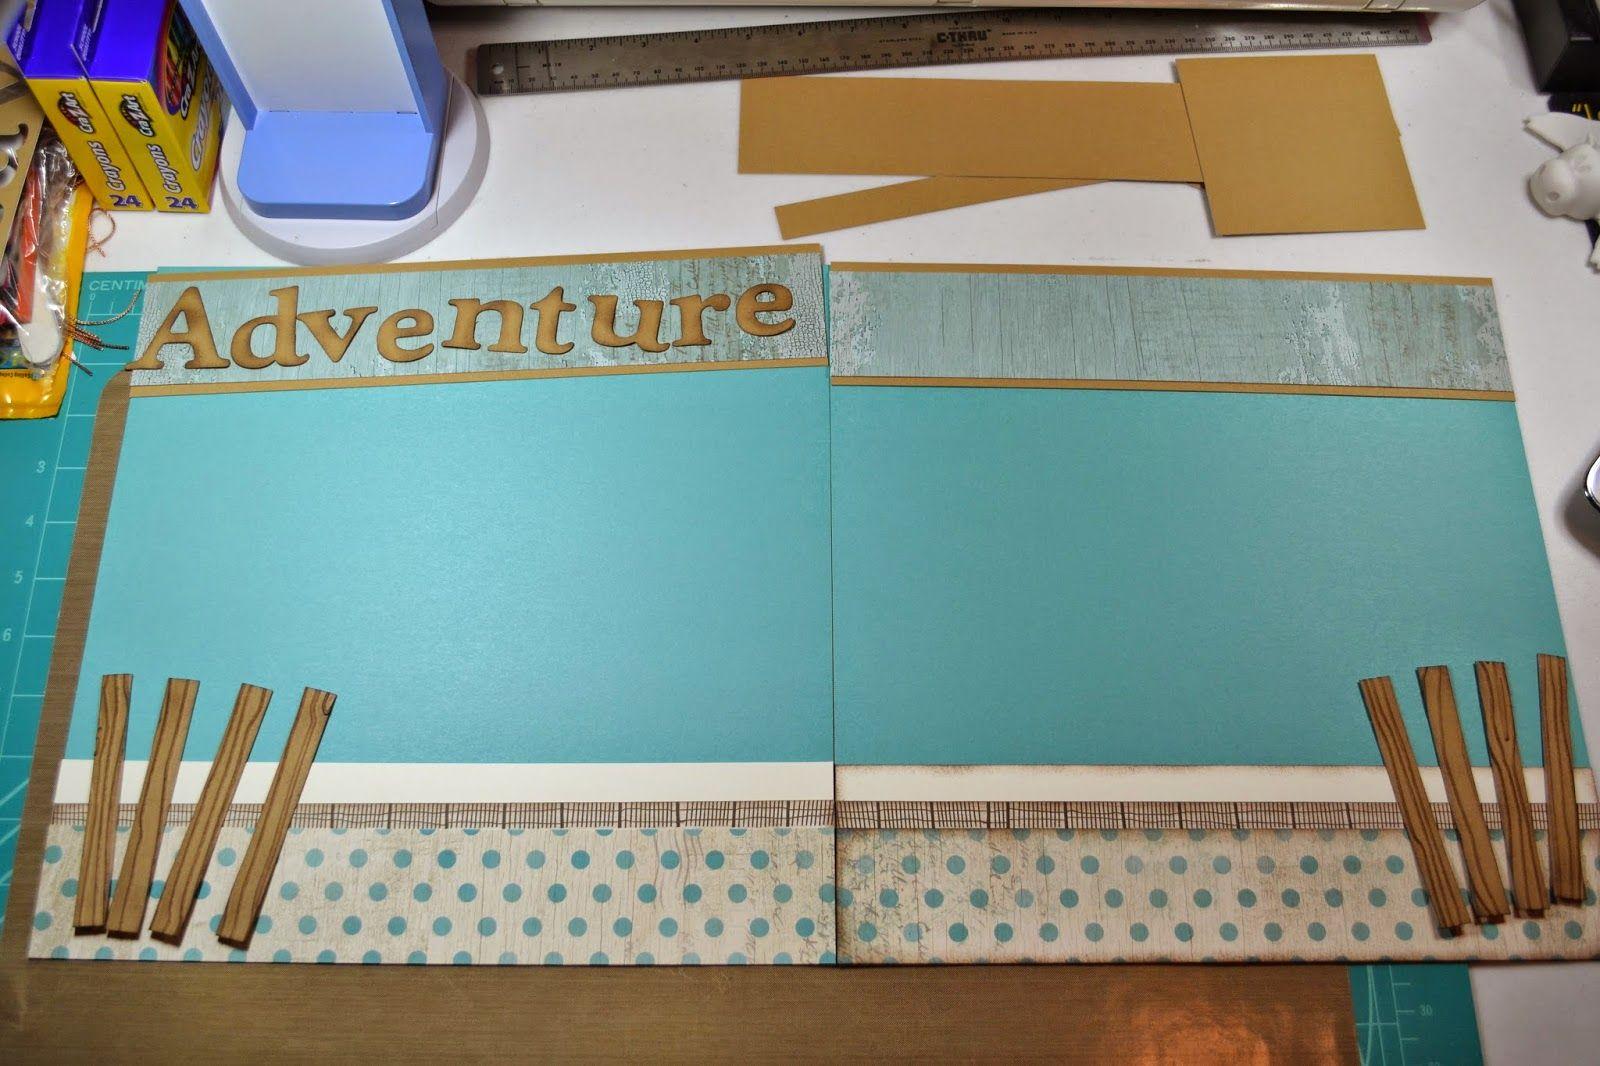 Kim Ferguson's Crafting Blog - Rubber Stamping and Scrapbooking: Seaside Scrapbook Layout - Scrapbook Workshop